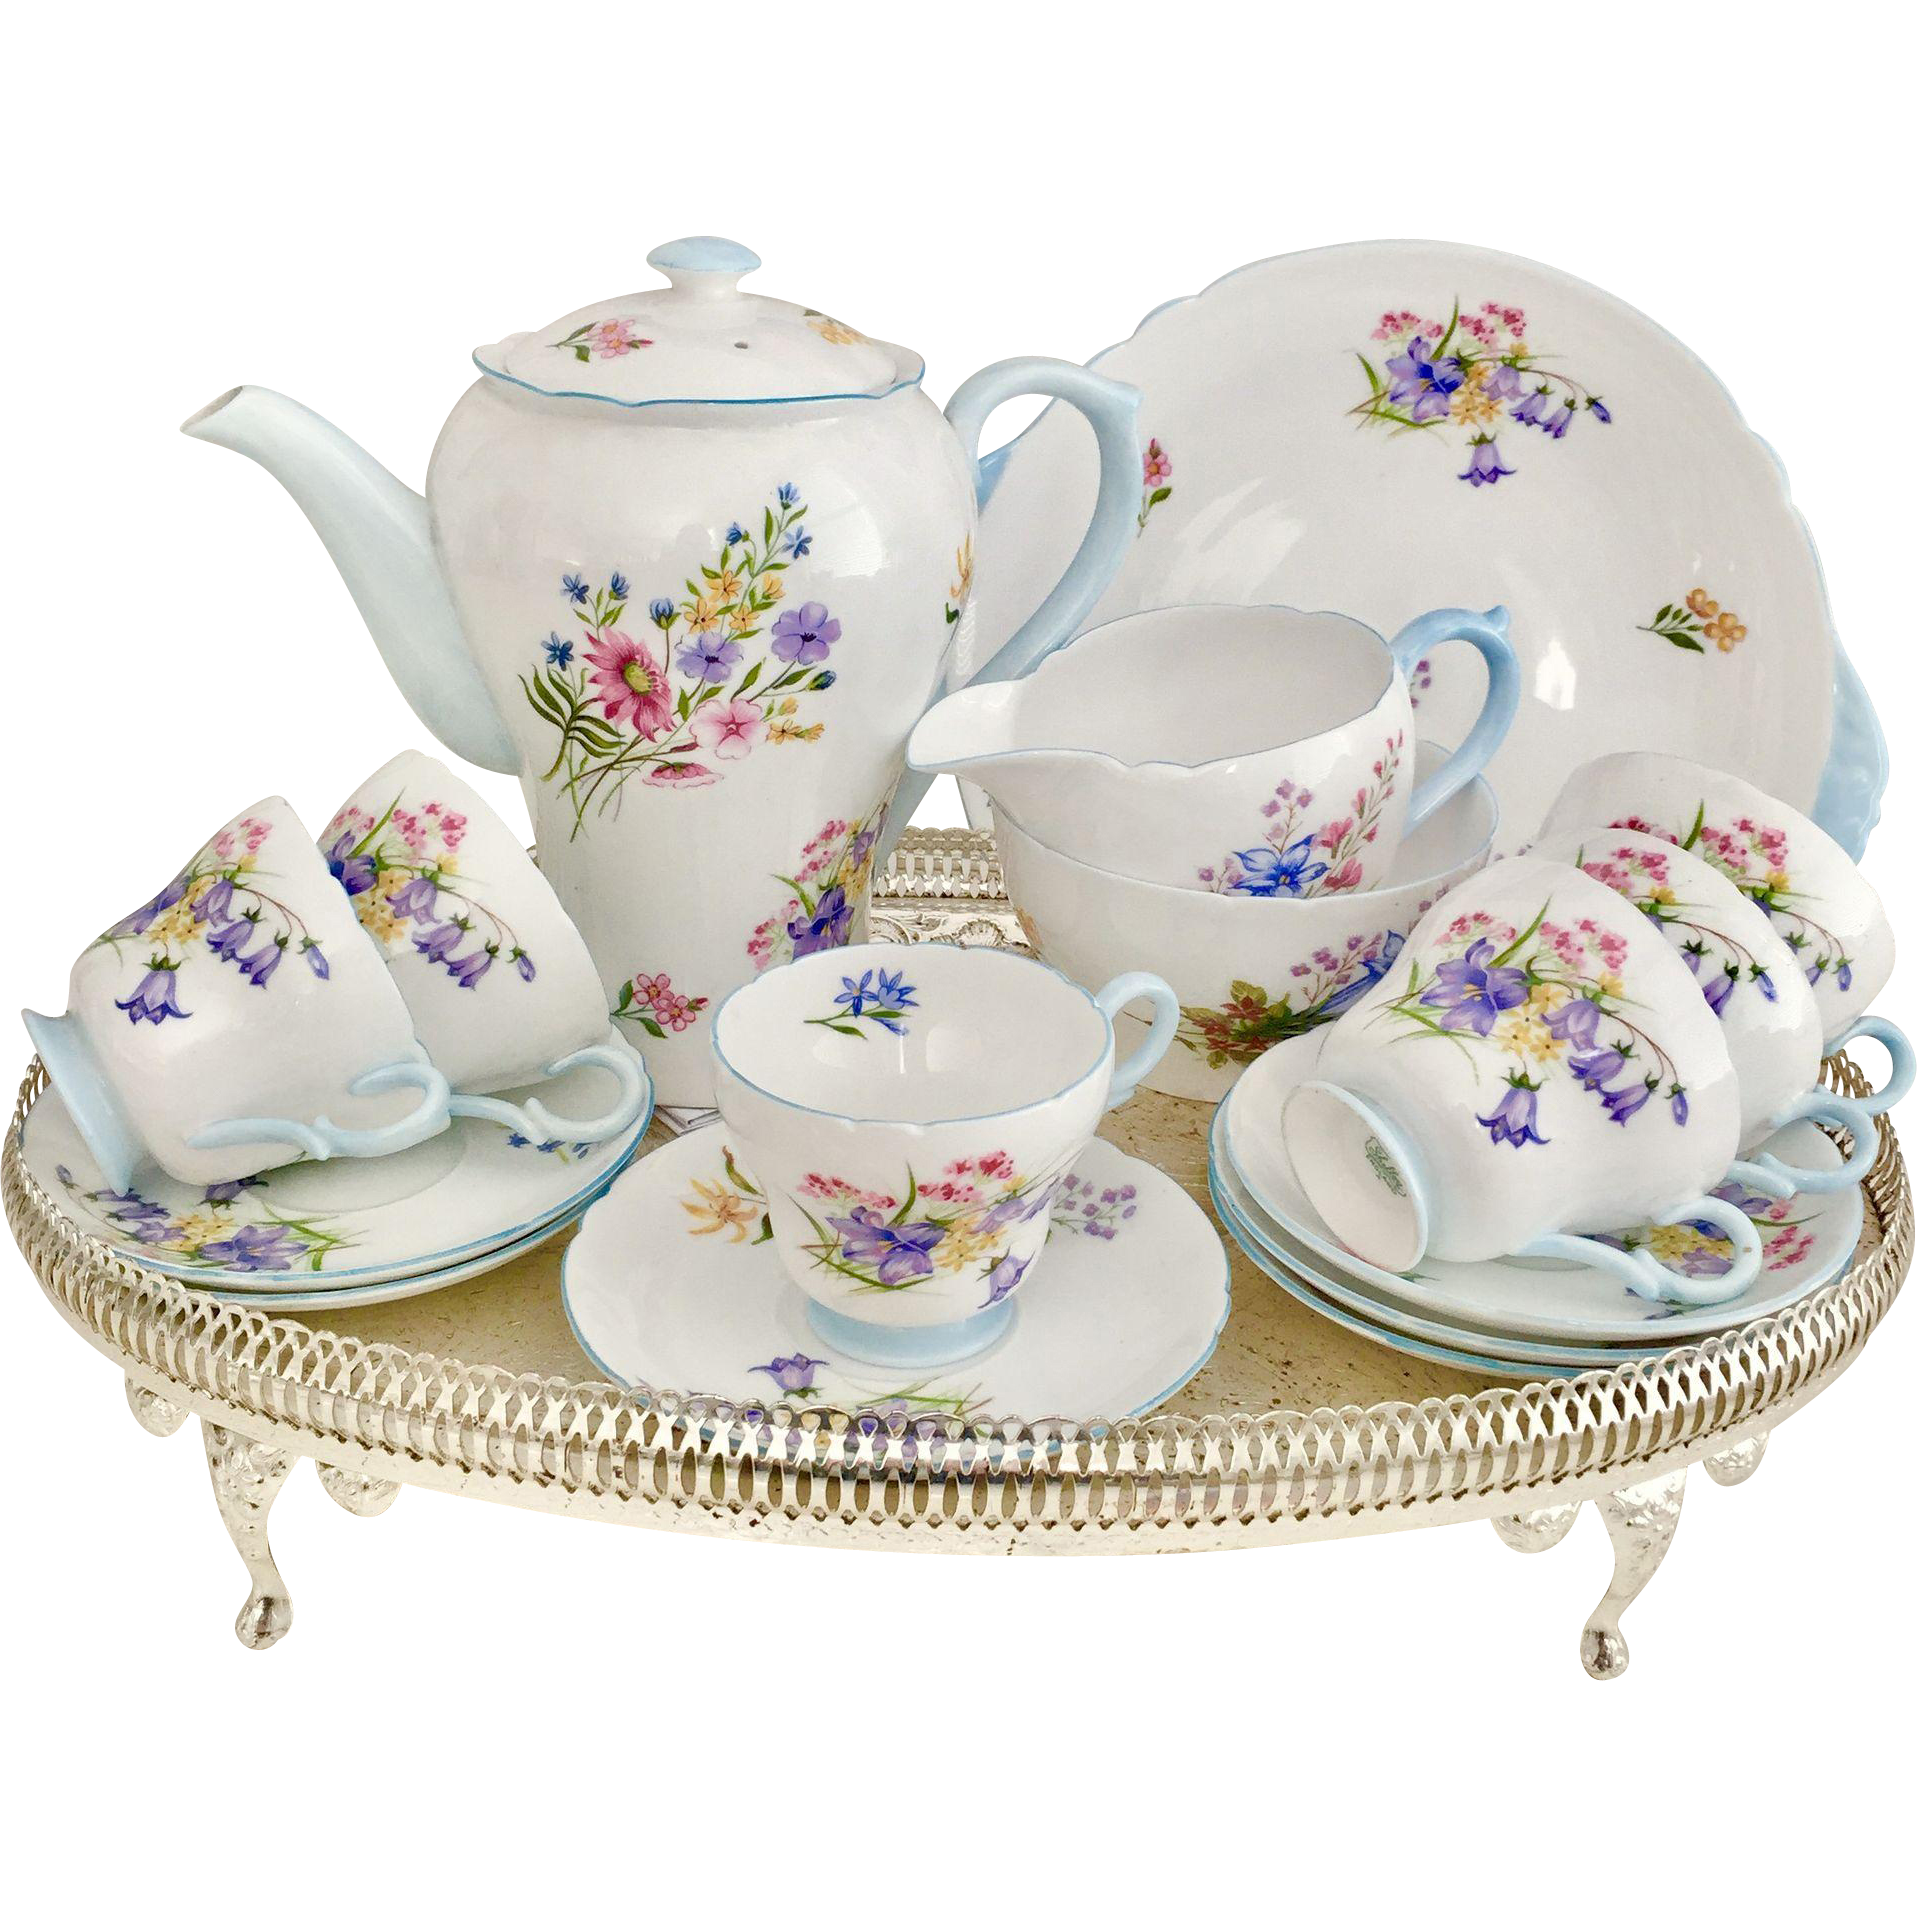 Shelley Full Tea Or Coffee Set For 6 In Mint Condition Vintage 1950s Mini Tea Set Antique Tea Sets Coffee Set